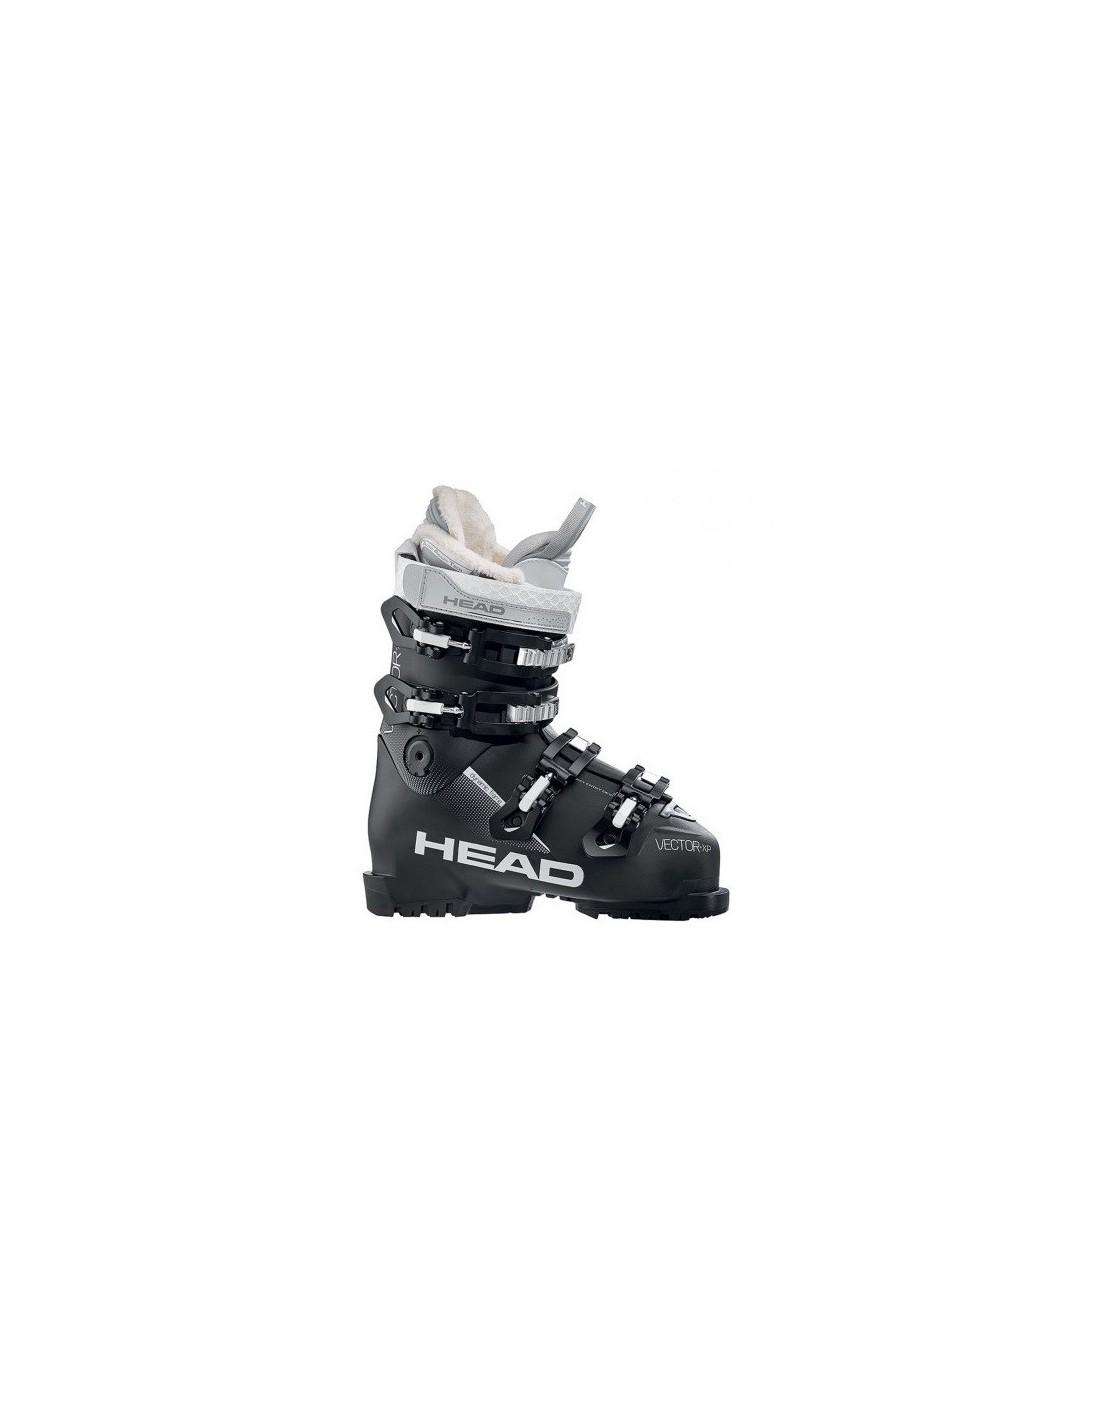 Head Vector XP Ski Boots